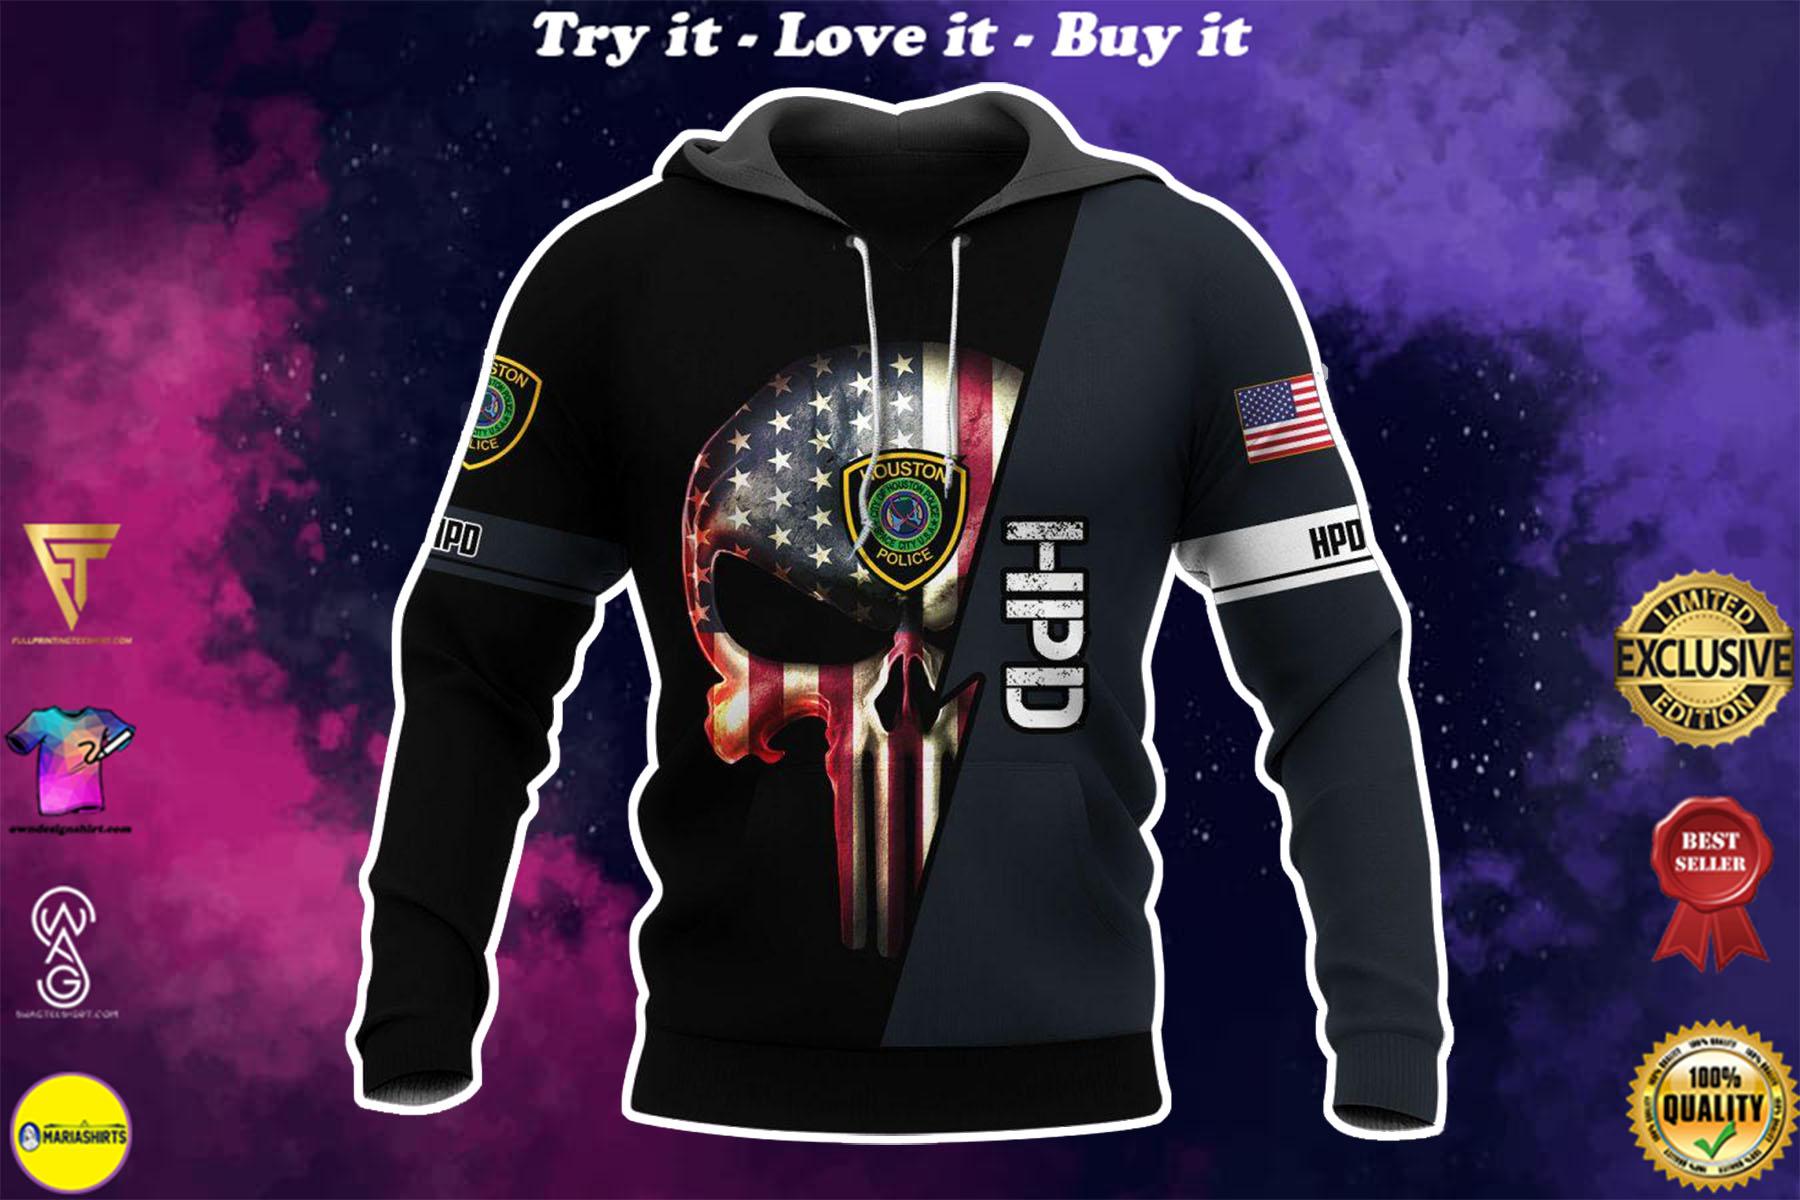 [highest selling] law enforcement houston police department skull full over printed shirt - maria